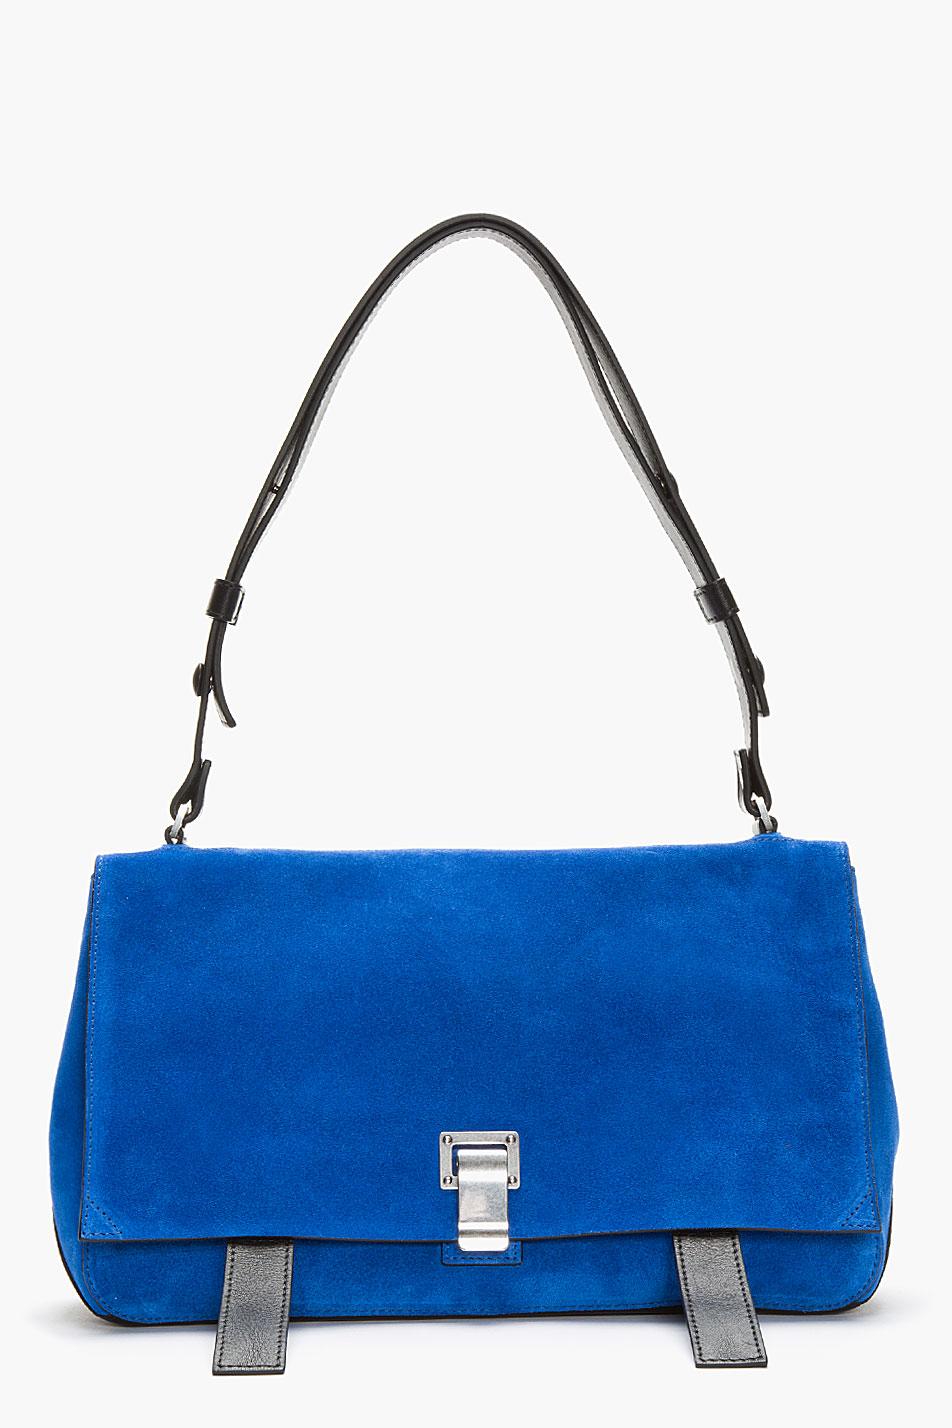 Proenza Schouler Royal Blue Suede PS Courier Shoulder Bag in Blue